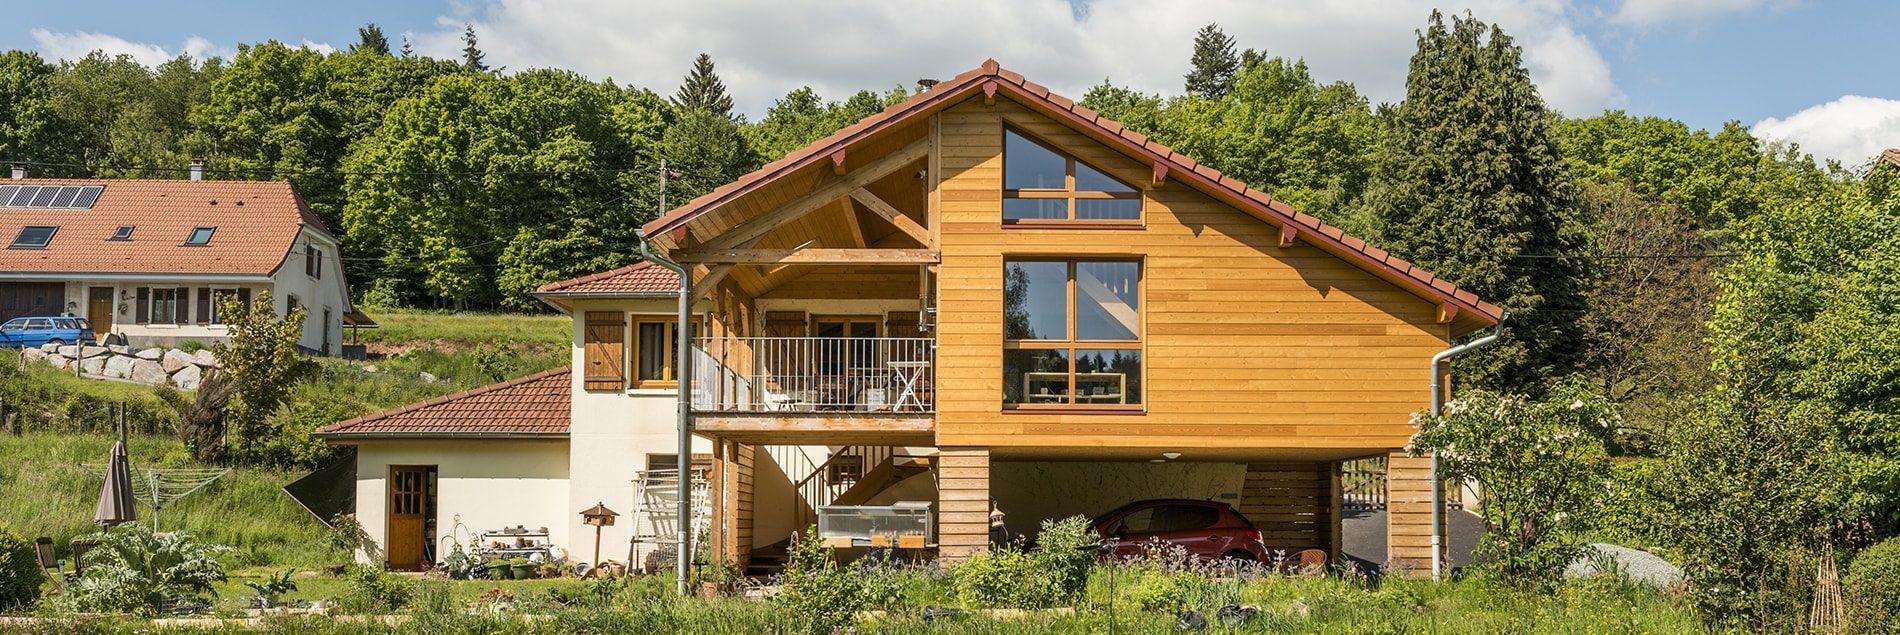 agrandir sa maison à Grenoble